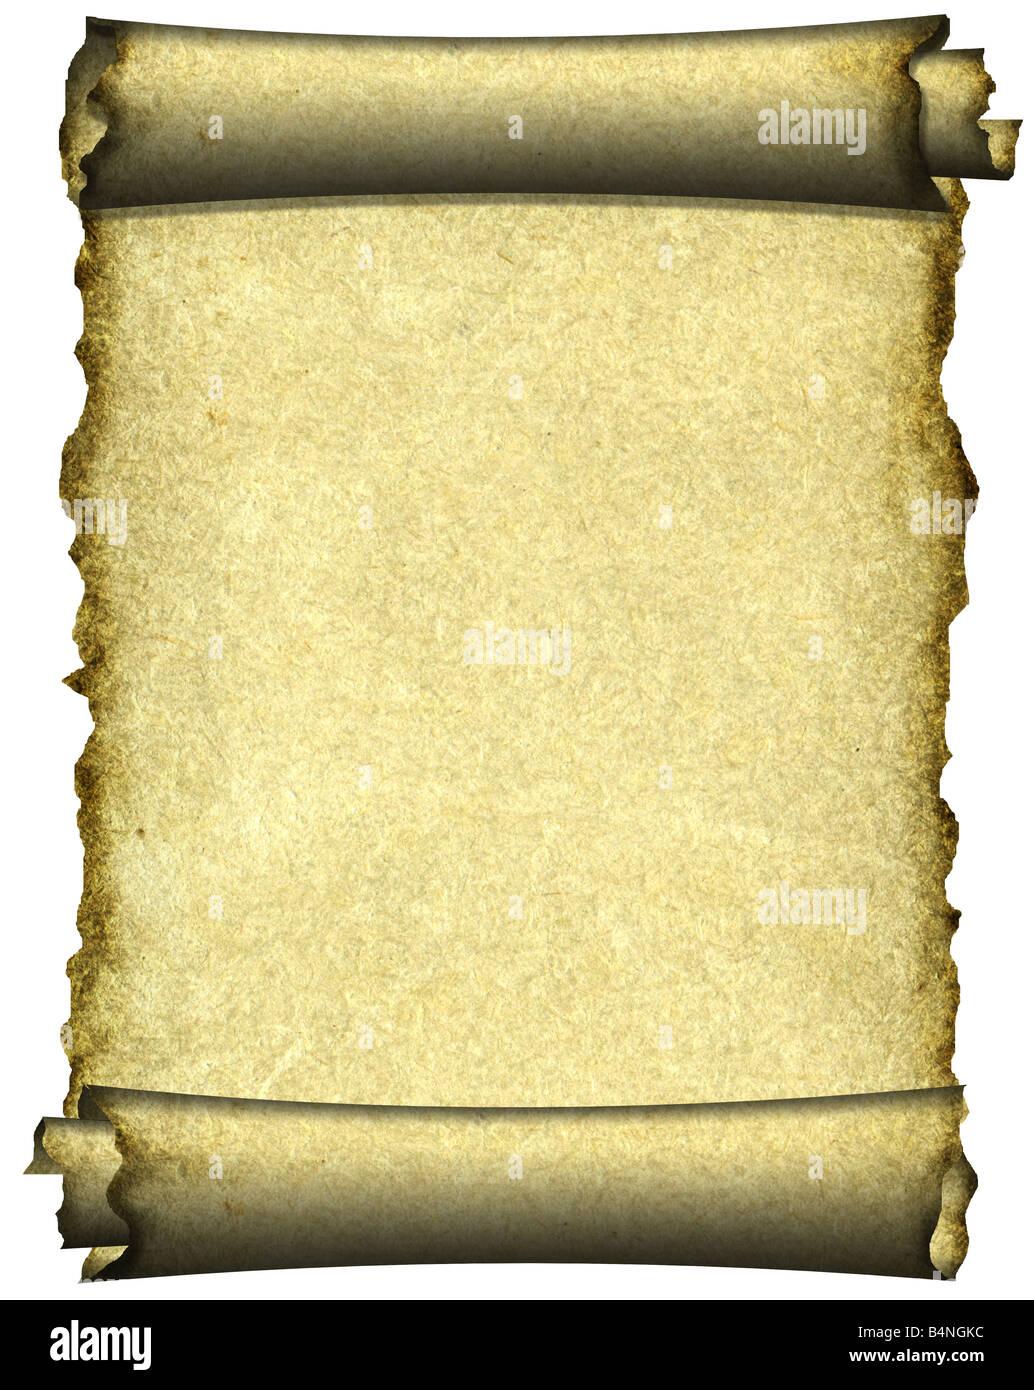 Manuscript burnt rough roll of parchment paper texture background - Stock Image